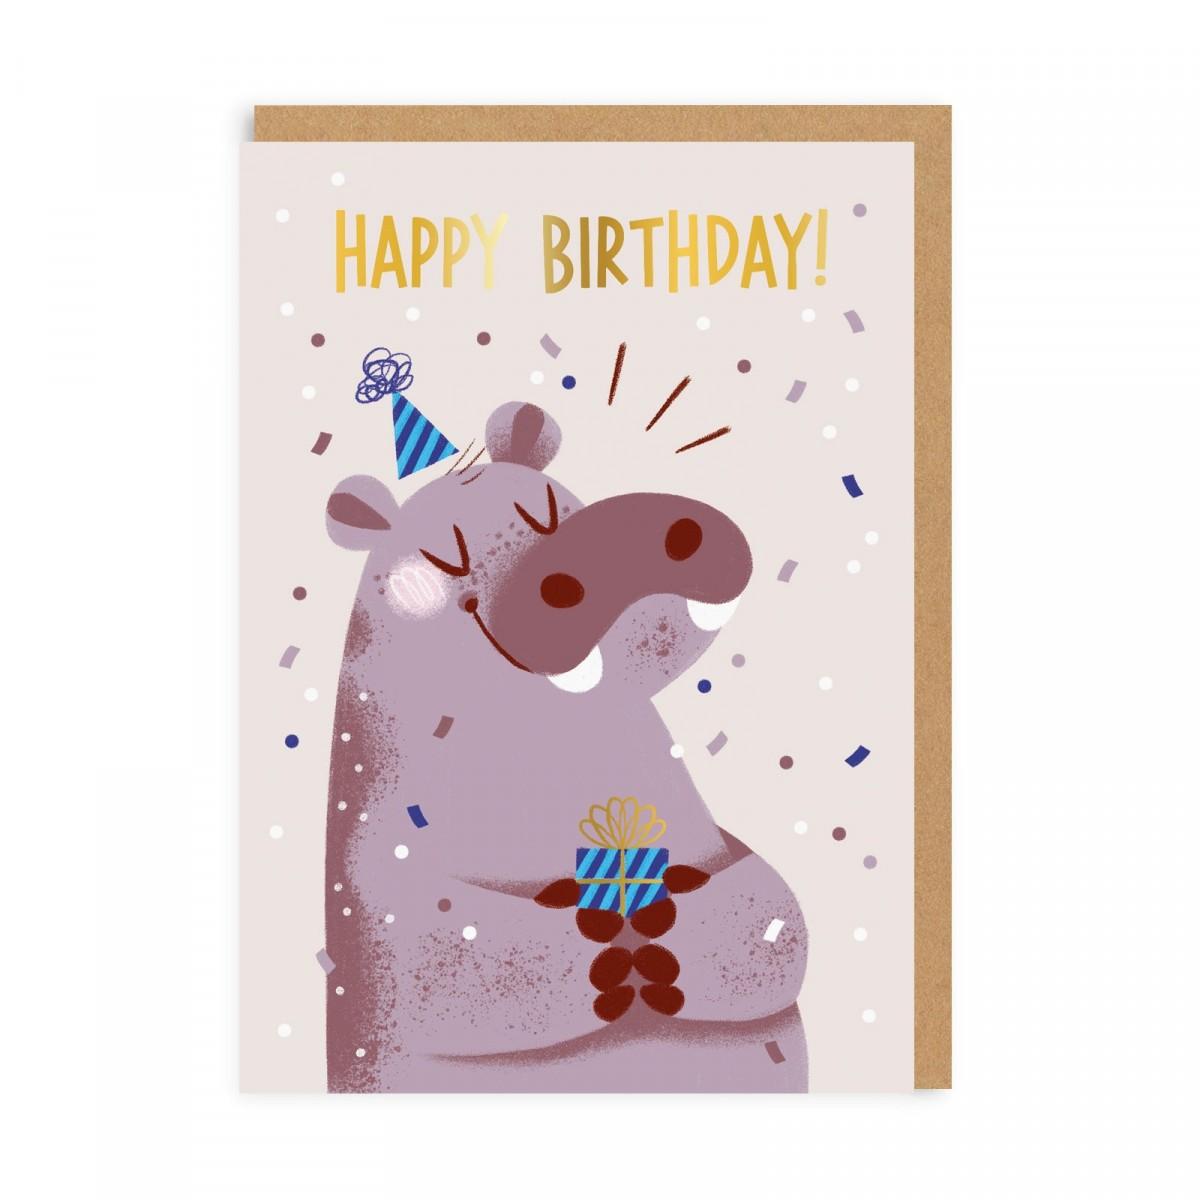 msy-gc-019-a6_happy_birthday_hippo.jpg